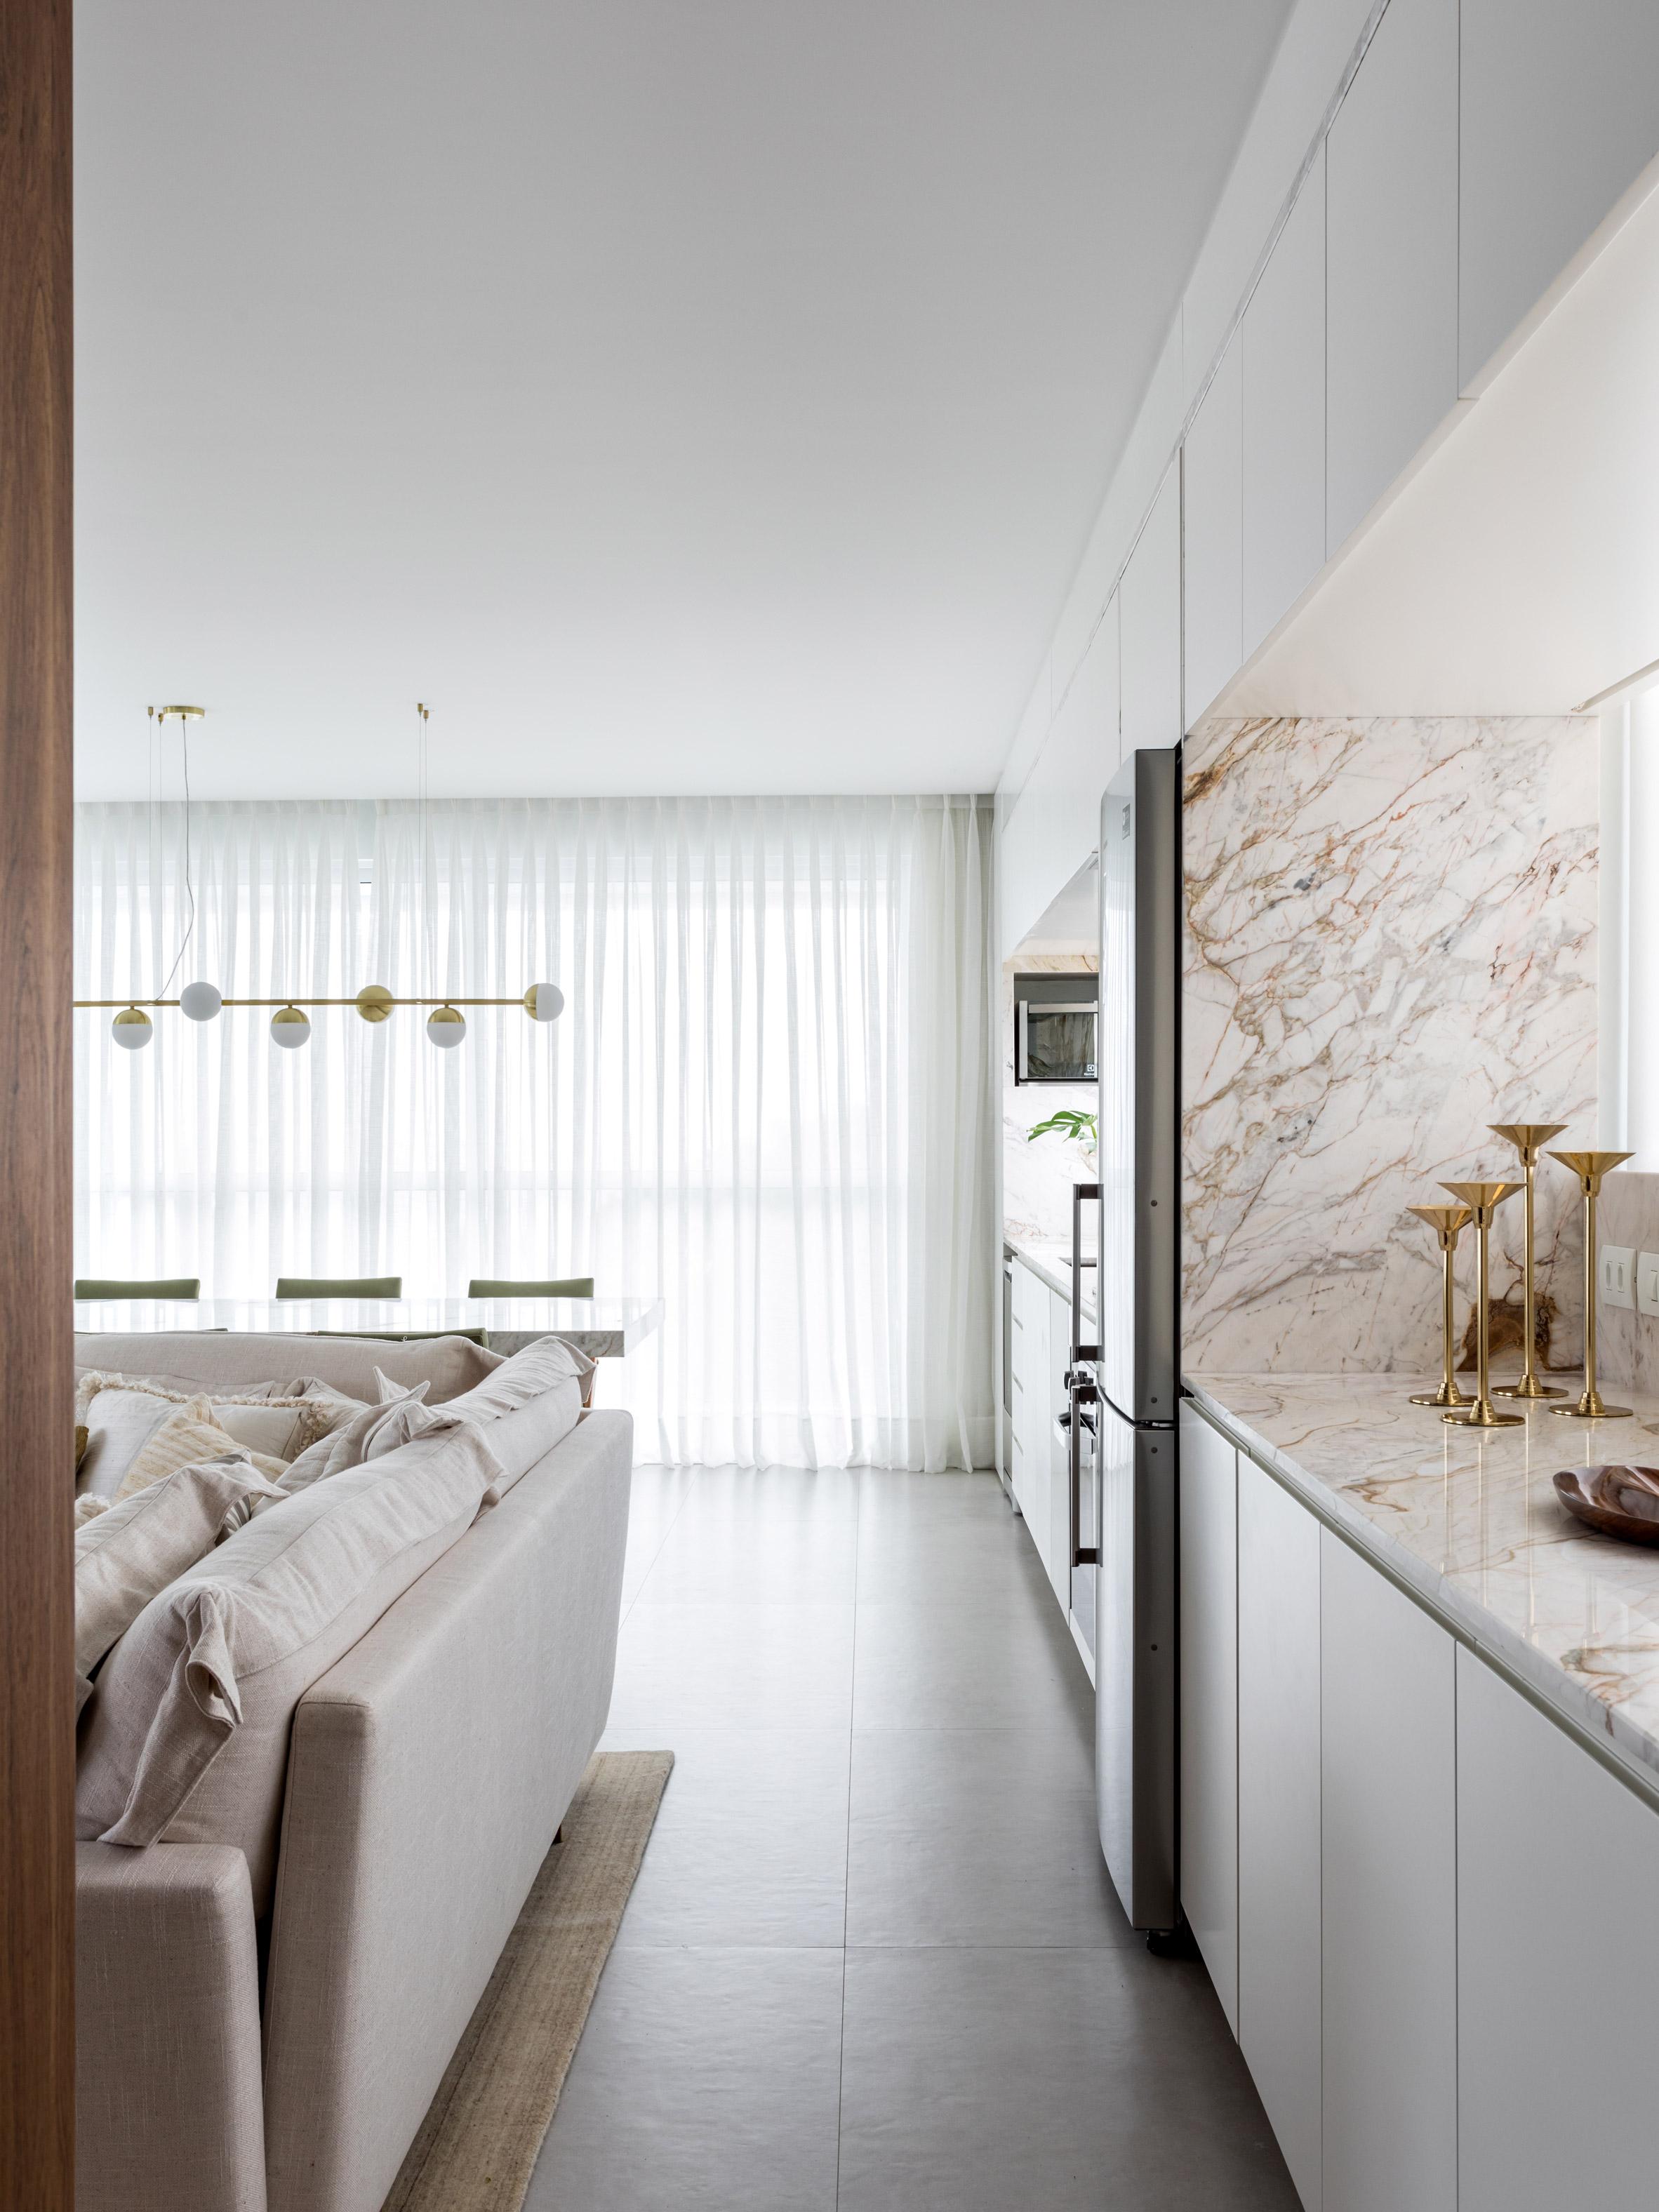 praia mansa apartment leandro garcia interiors brazil dezeen 2364 col 22